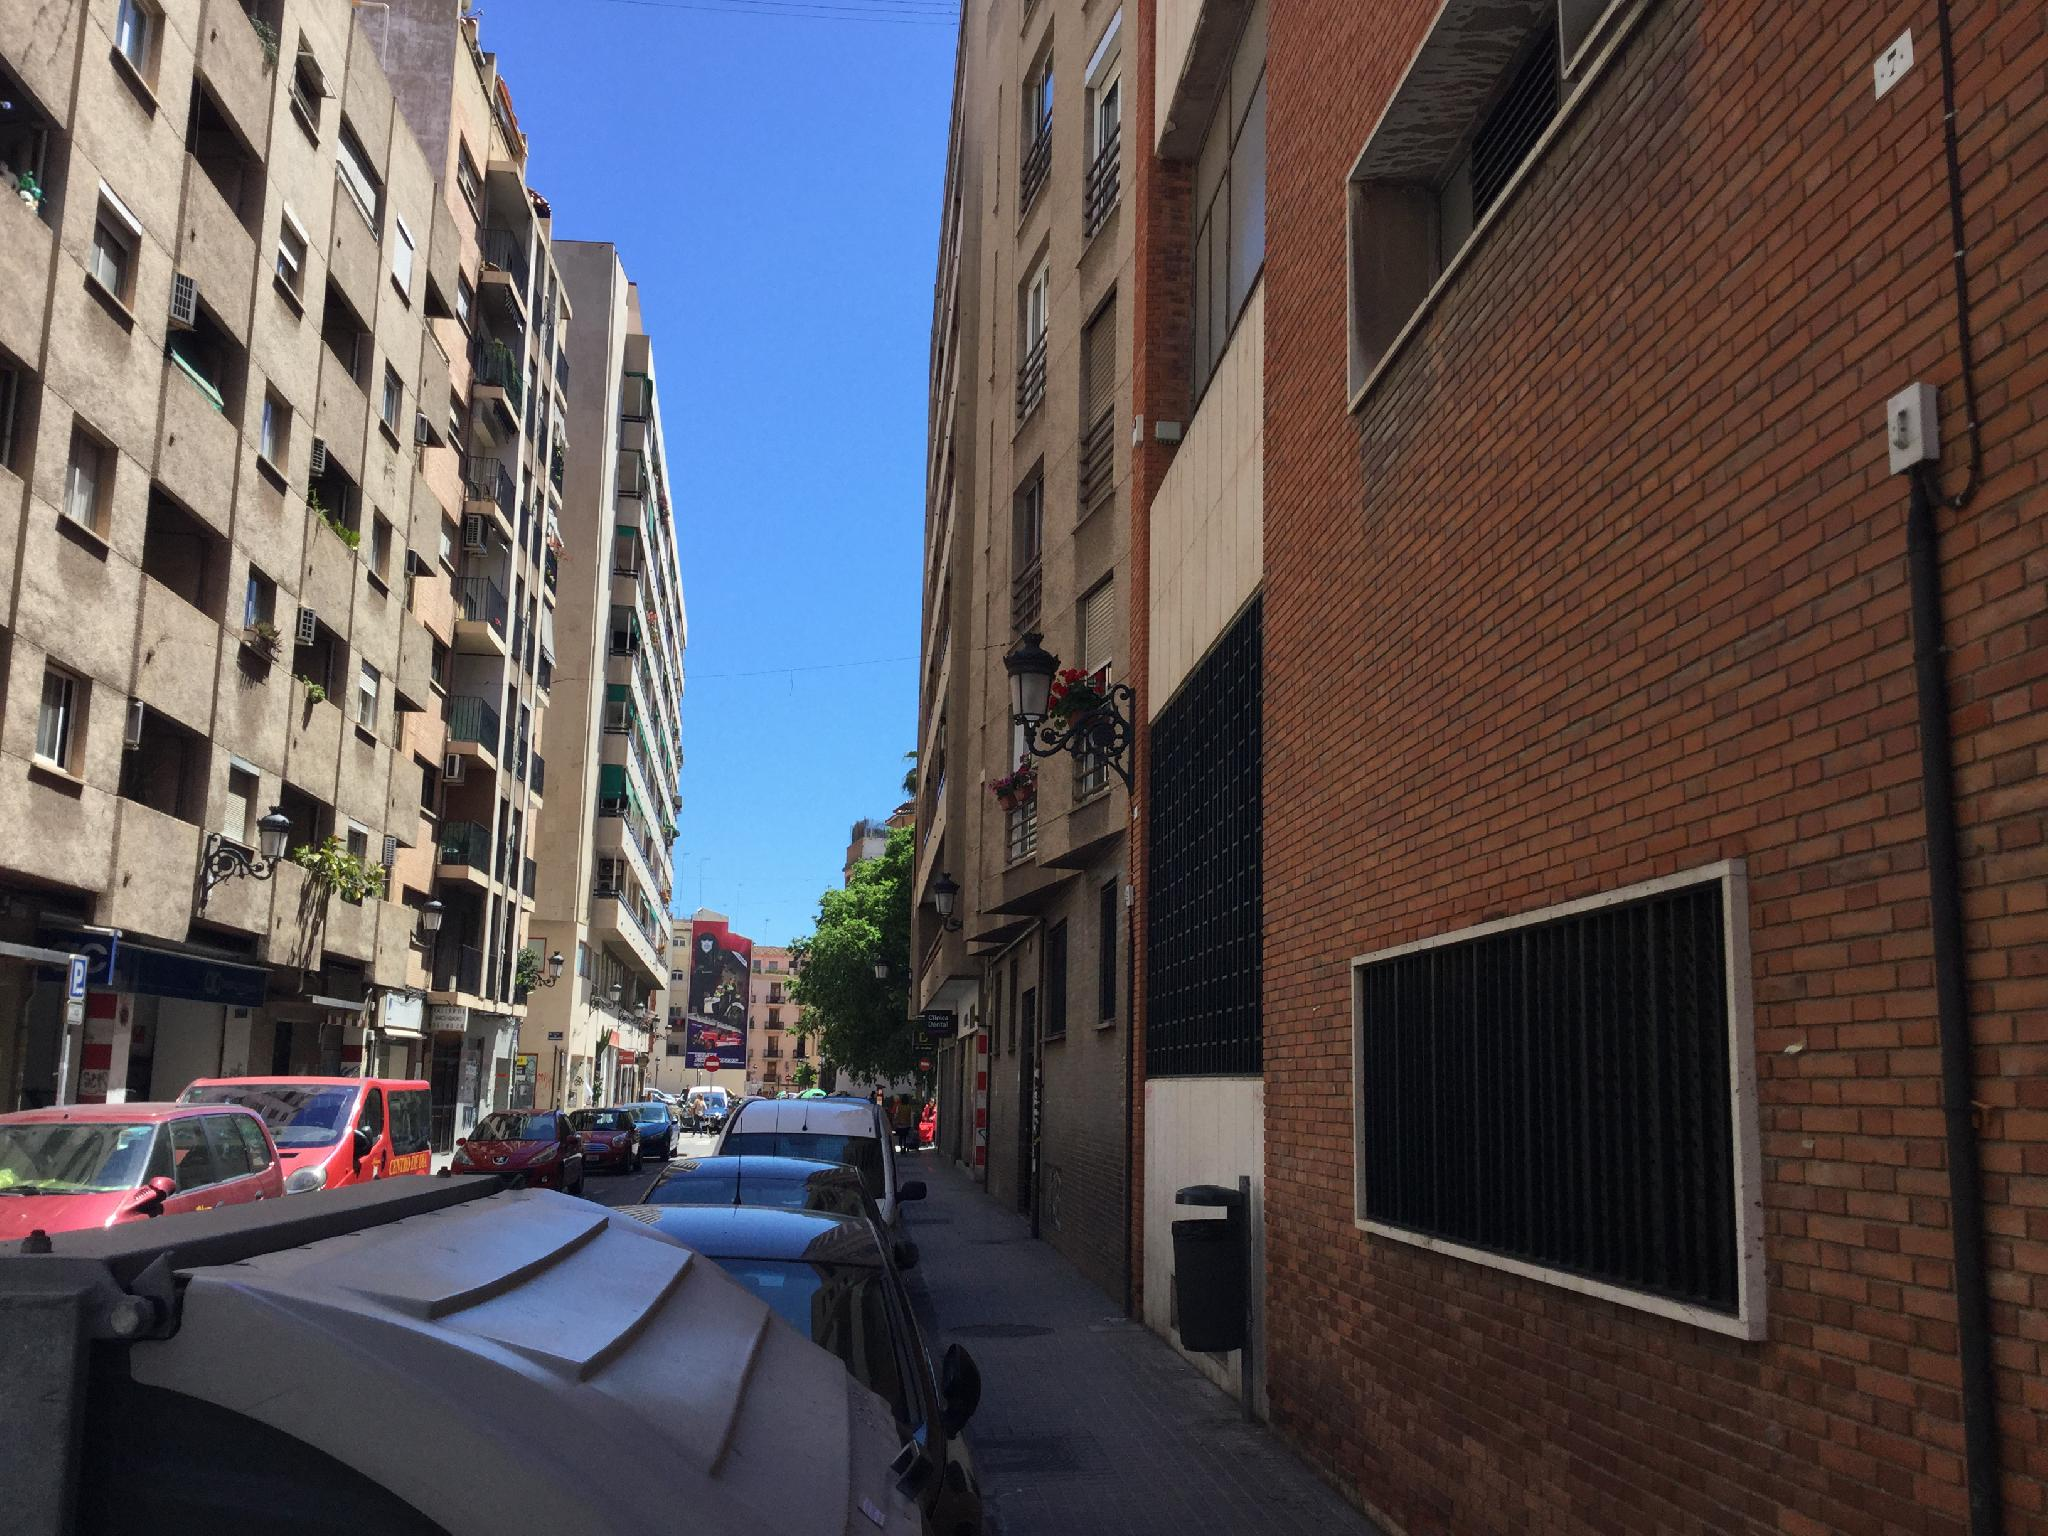 158212 - Junto a Plaza del Tossal